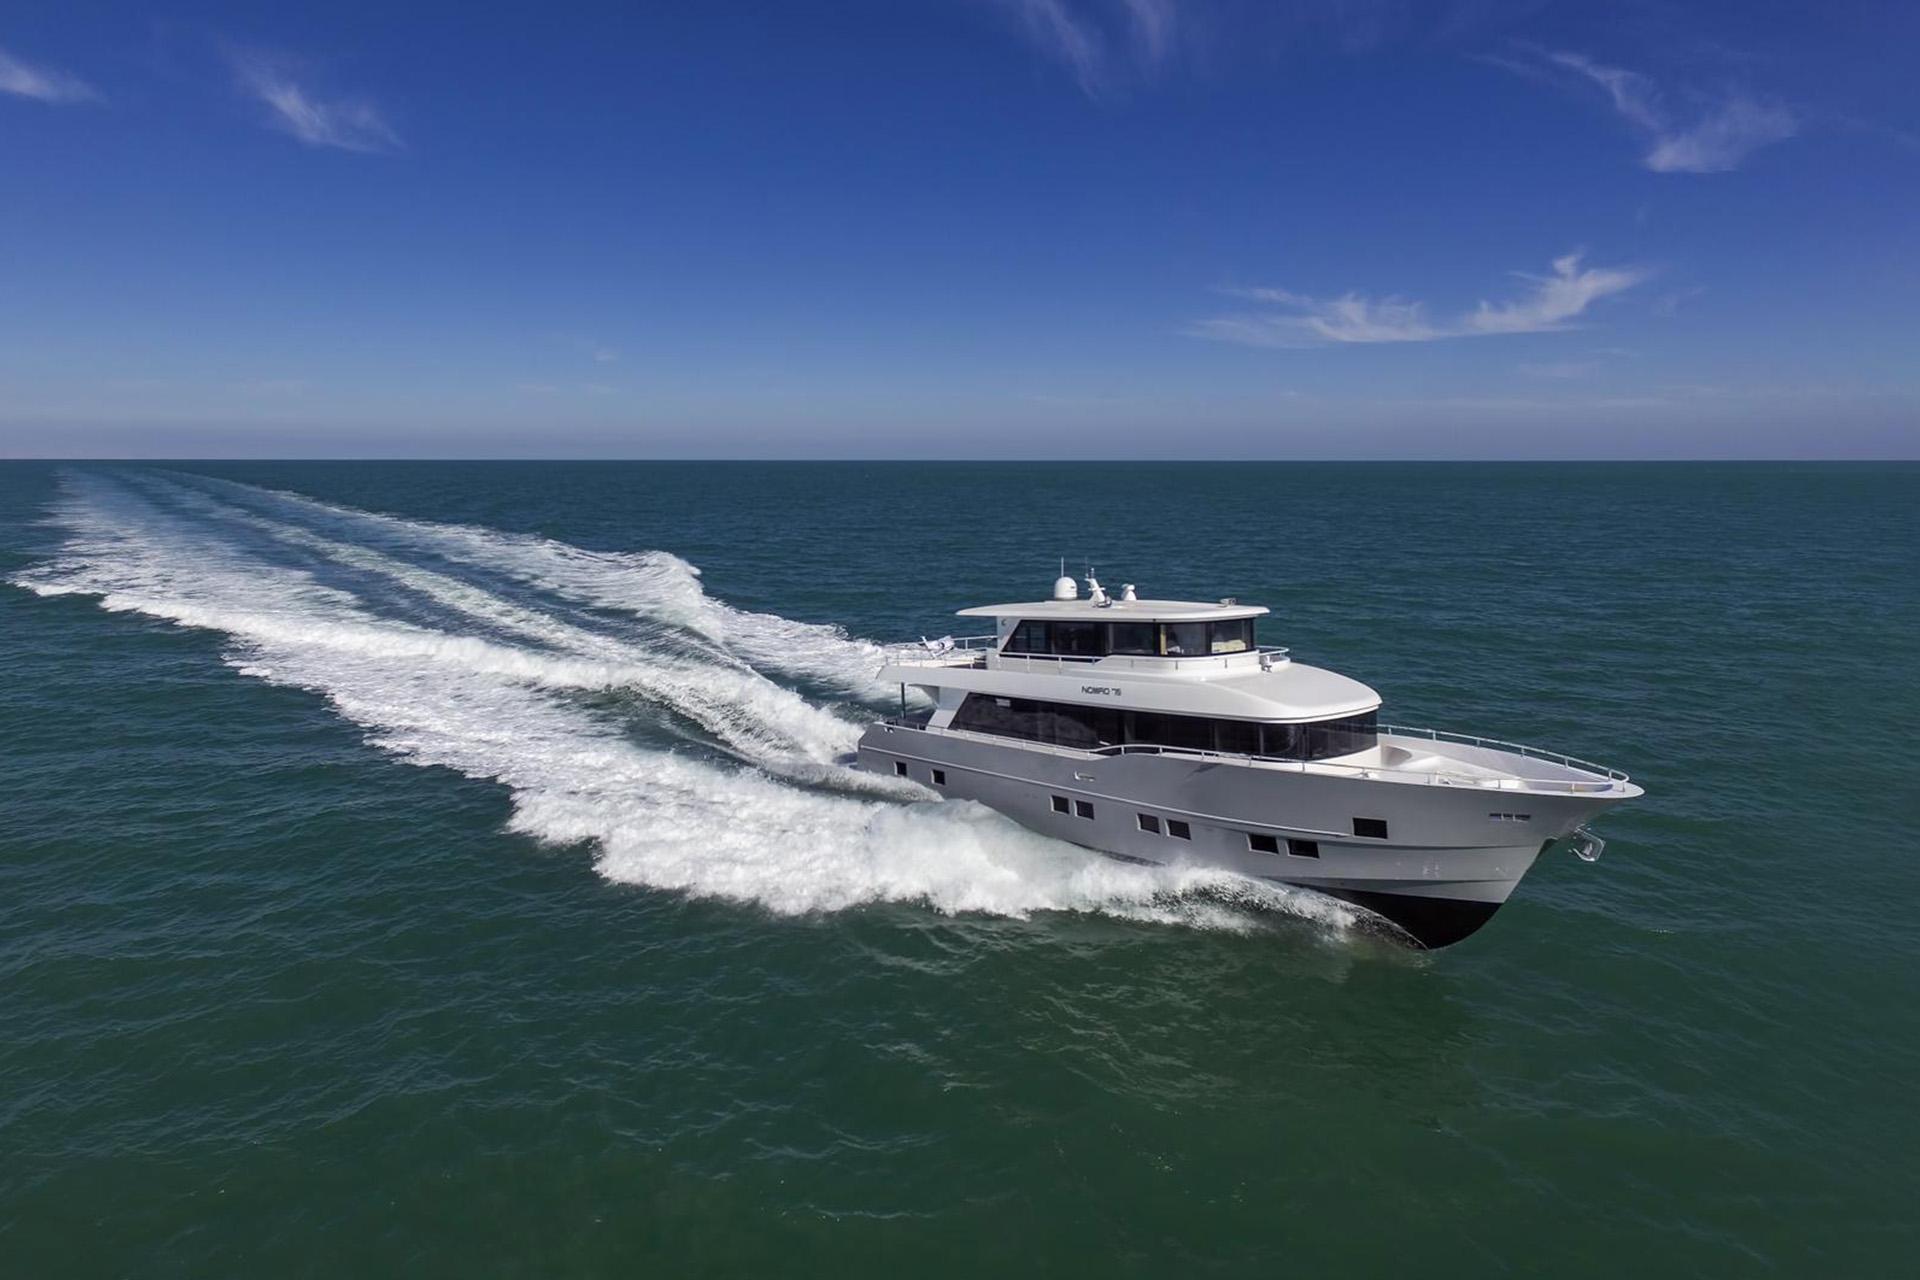 Nomad 75 SUV - Nomad Yachts by - Drettmann Yachts